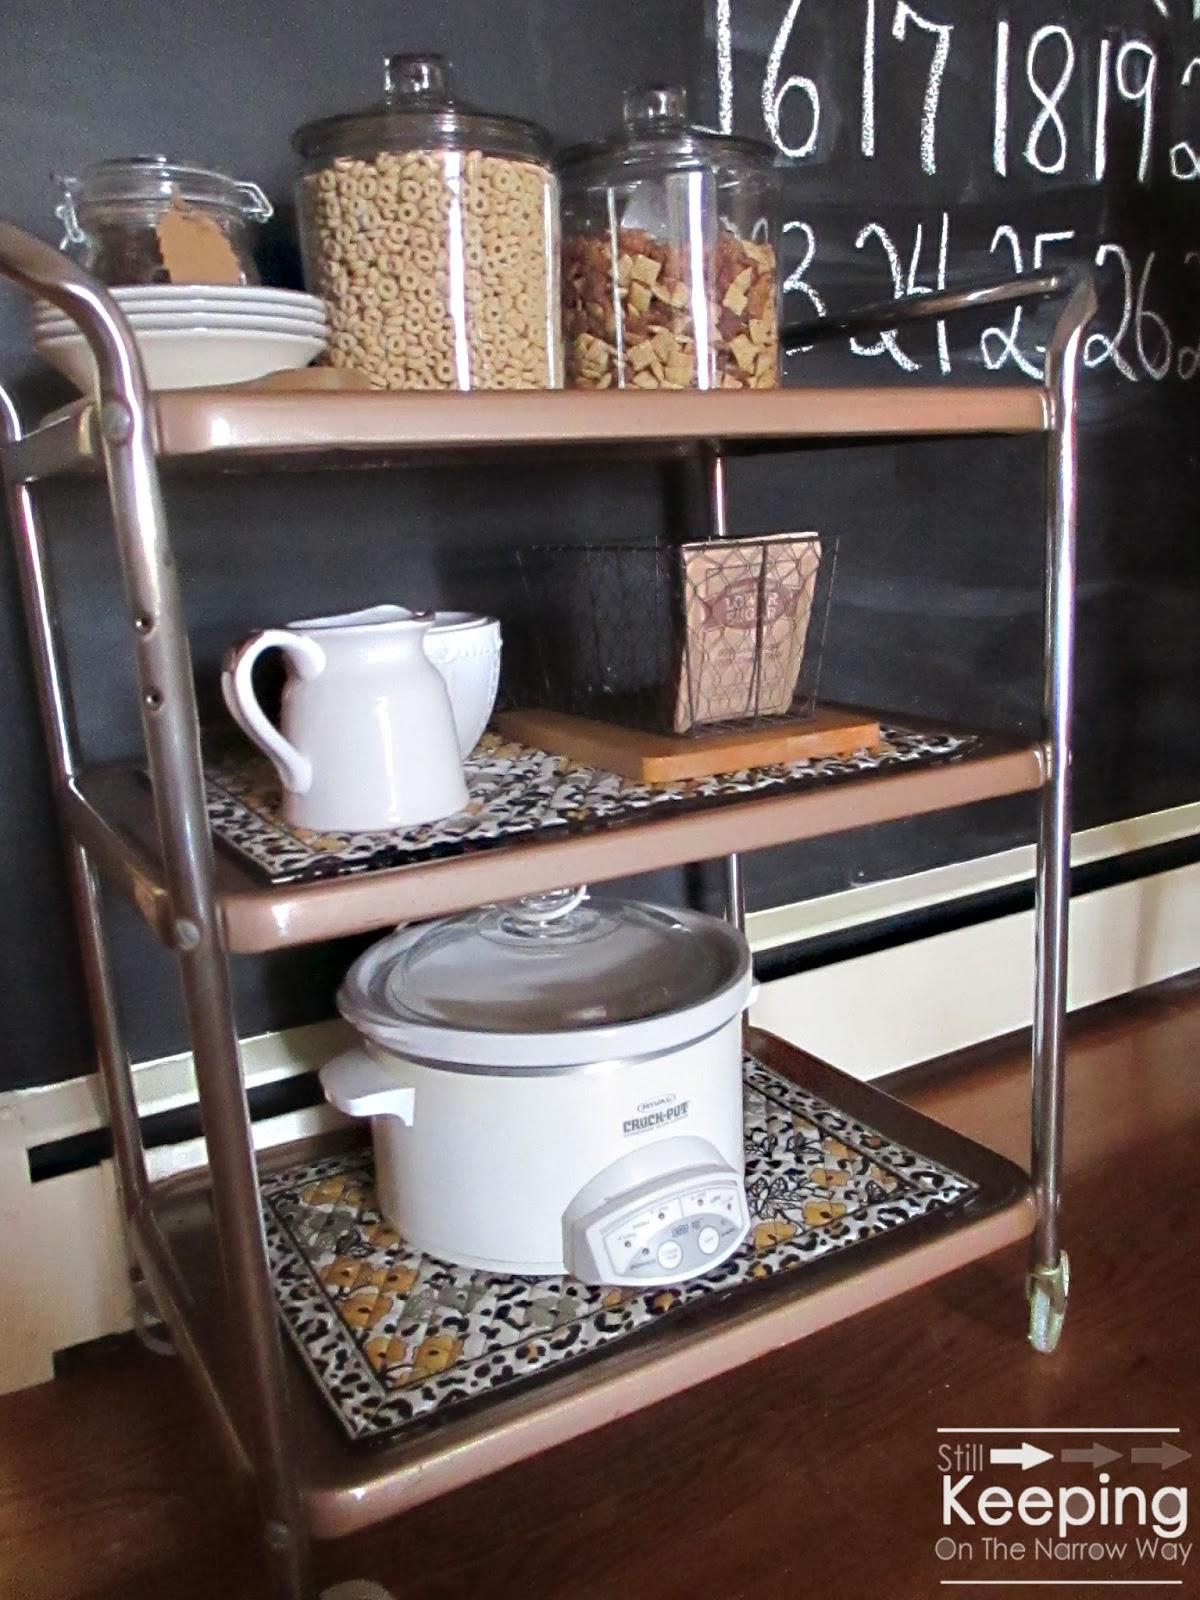 Still Keeping The Narrow Way The Art Improvisation A Kitchen Cart Mak